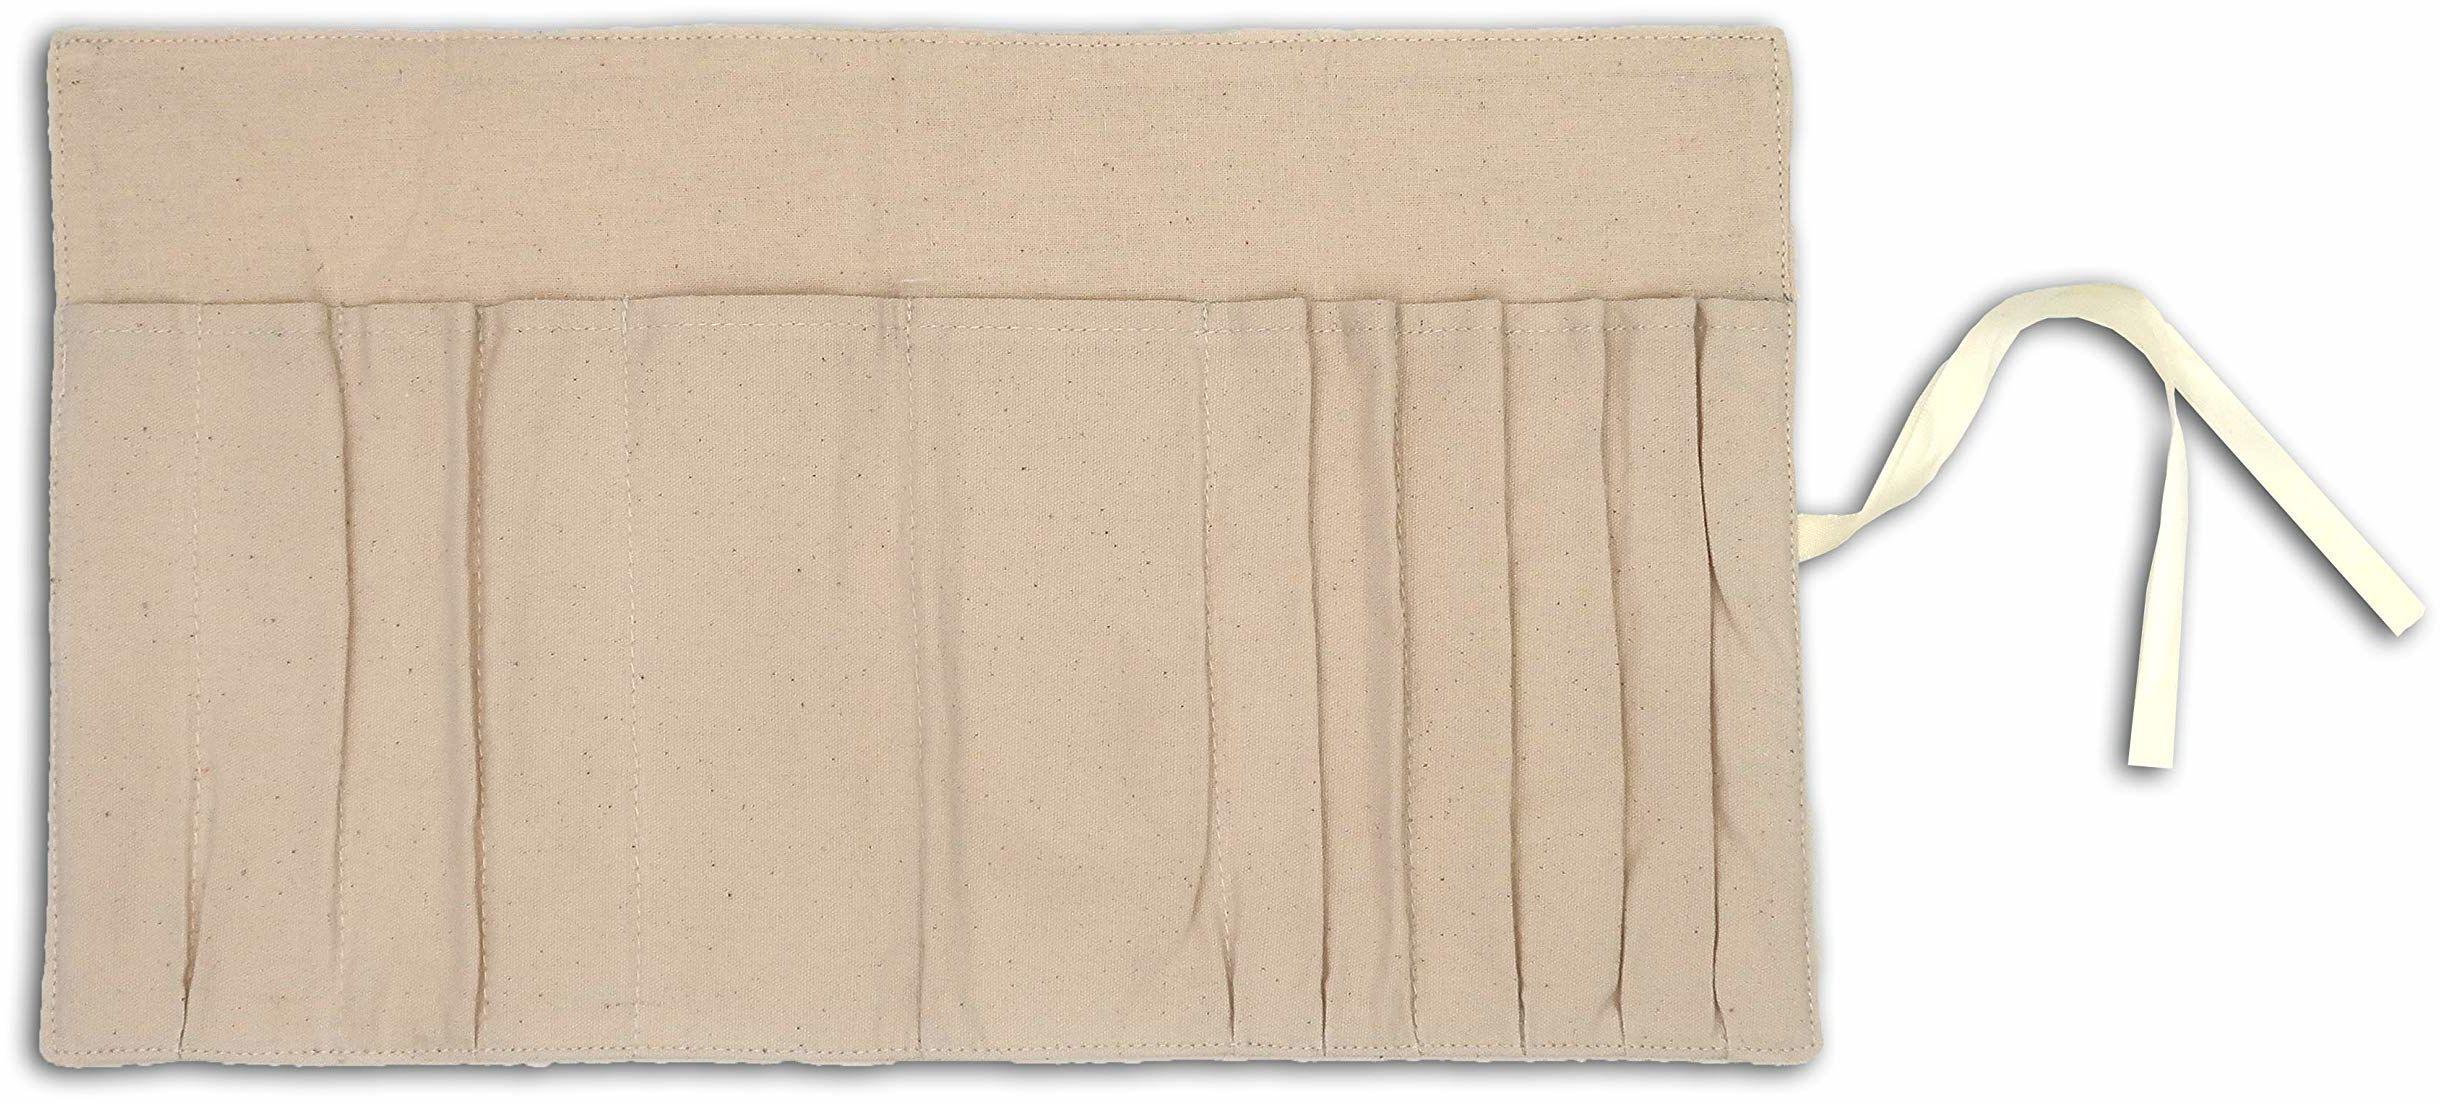 Mlle Toga etui na długopisy, Make Up, materiał, beżowy, 39 x 22 cm